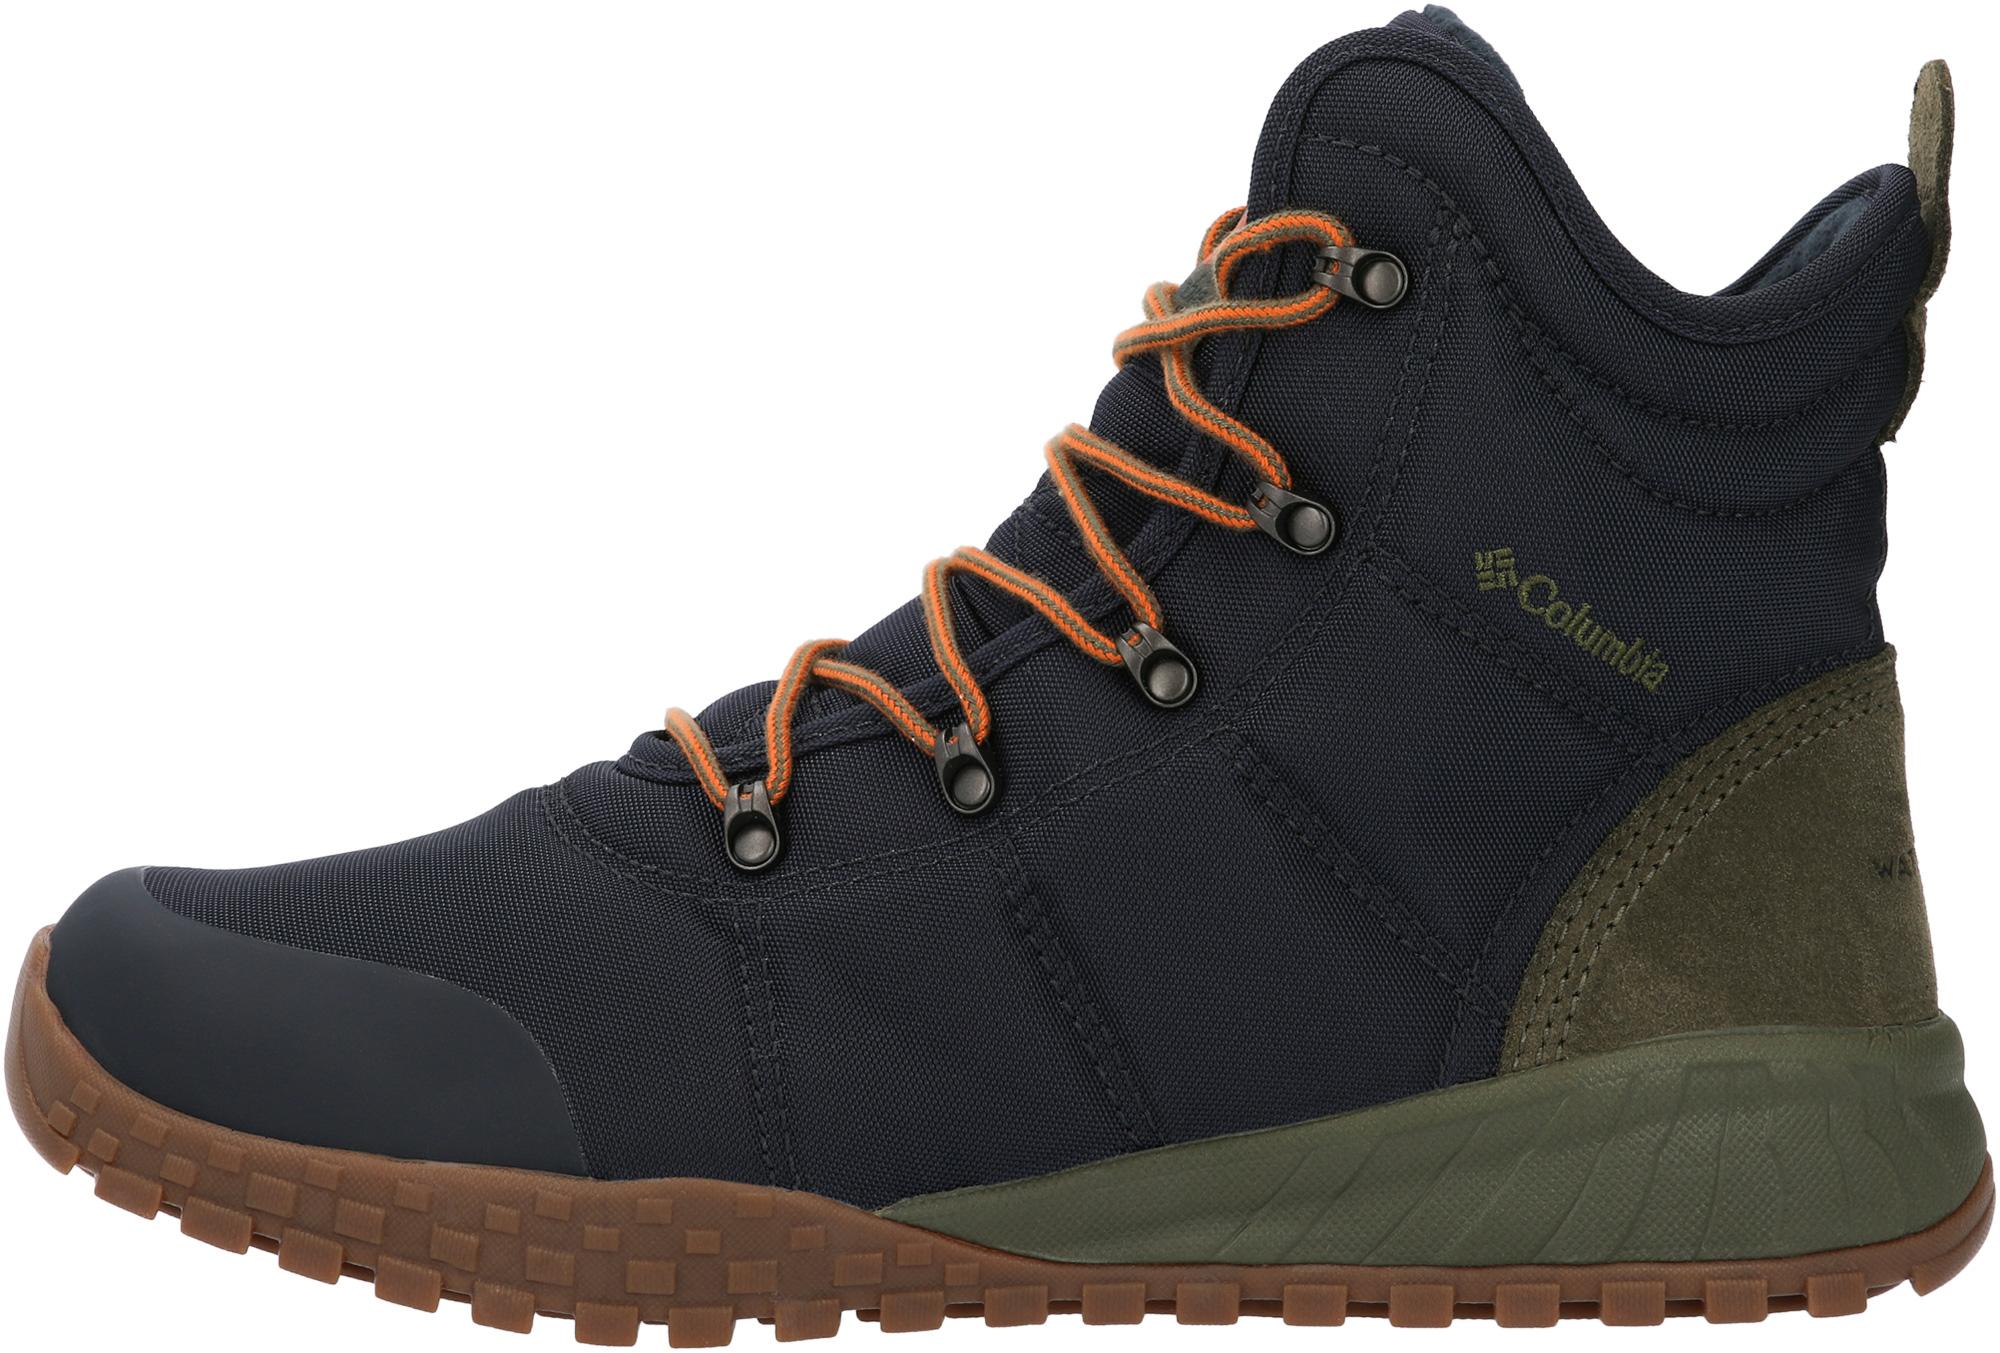 Columbia Ботинки утепленные мужские Columbia Fairbanks Omni-Heat, размер 43.5